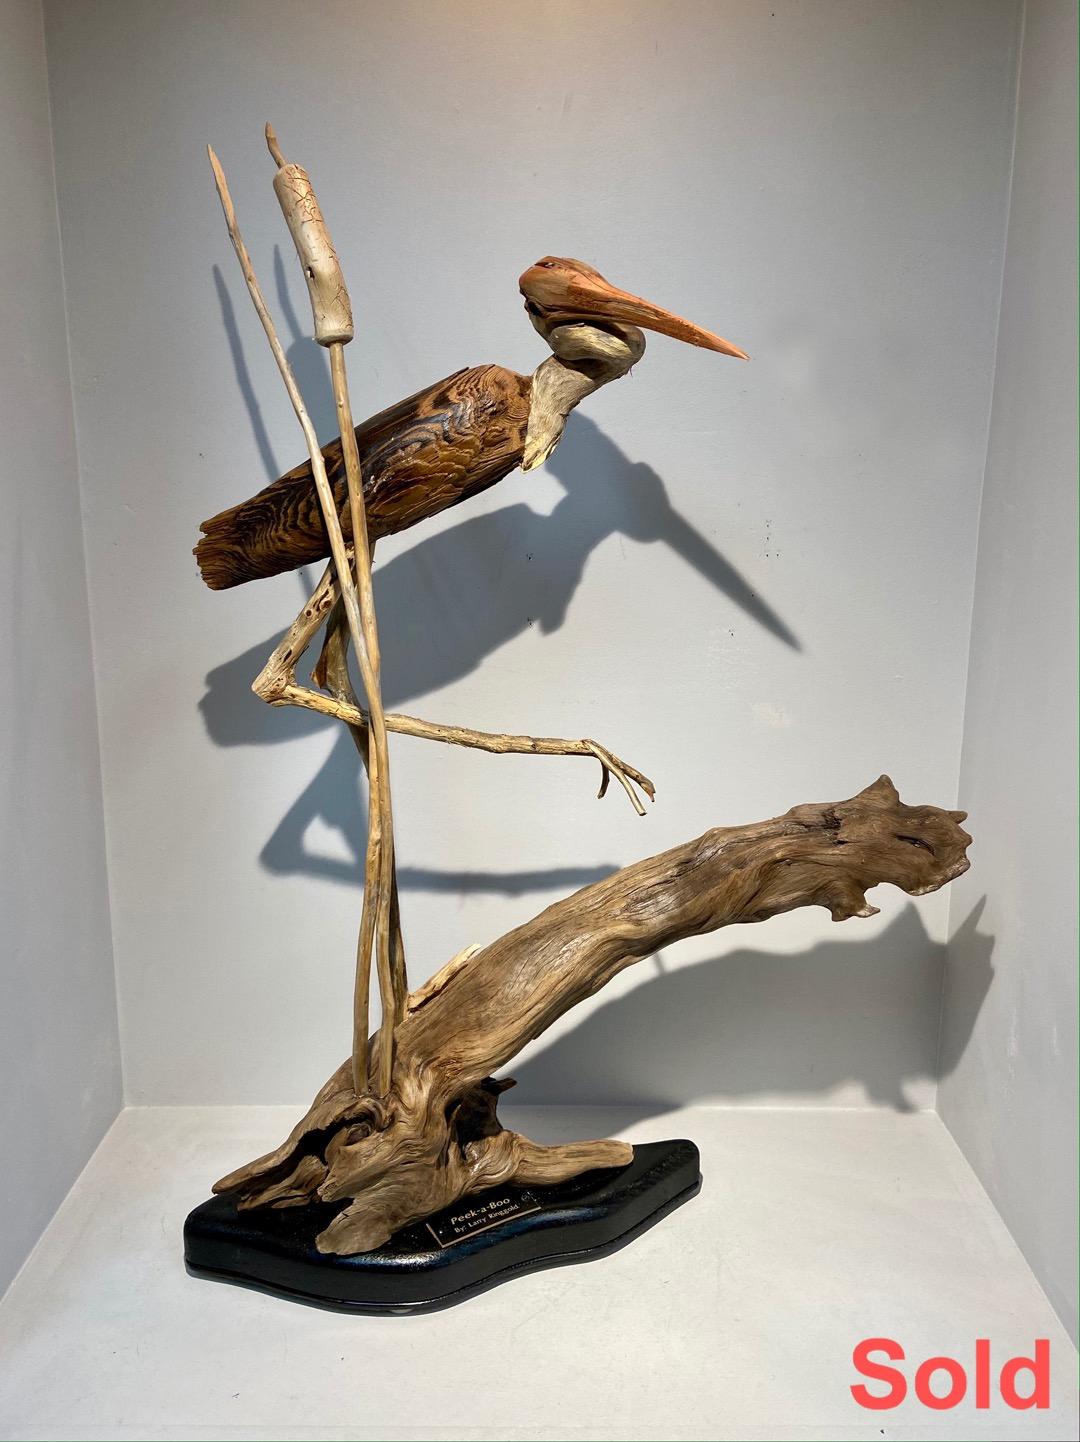 Artist Larry Ringgold